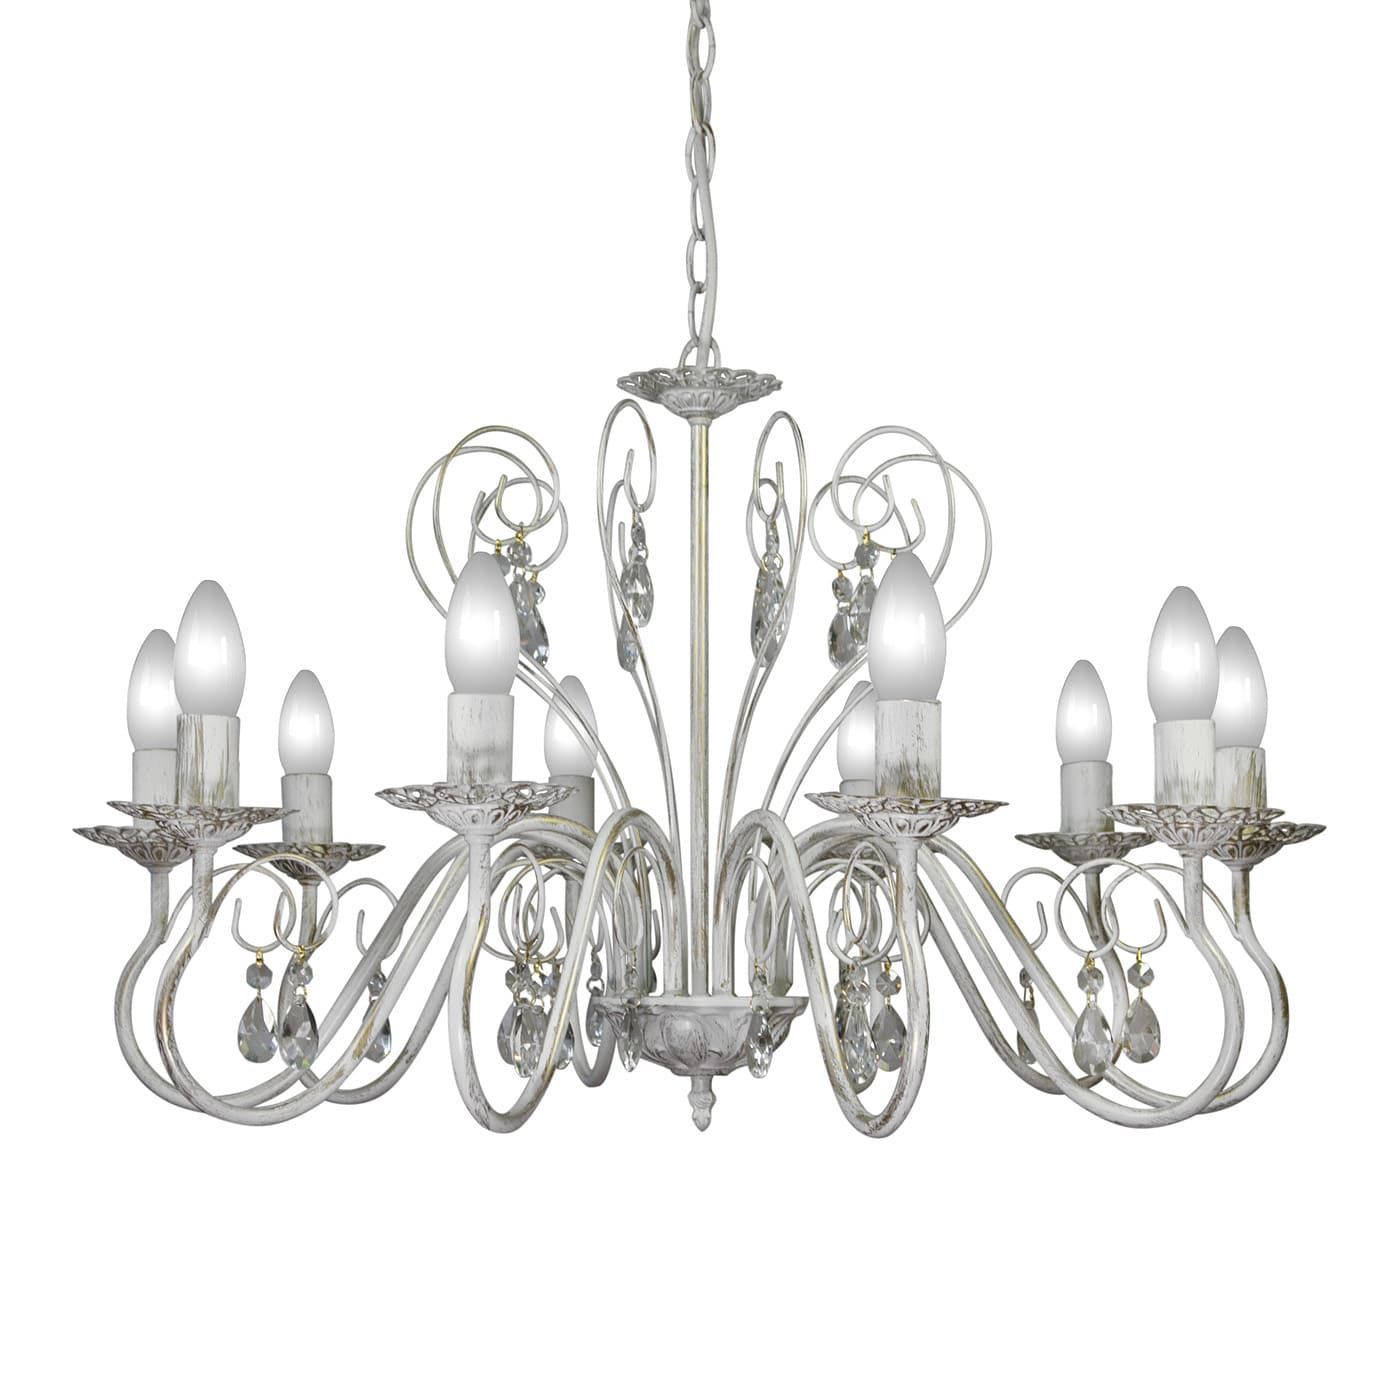 PETRASVET / Pendant chandelier S1163-10, 10xE14 max. 60W